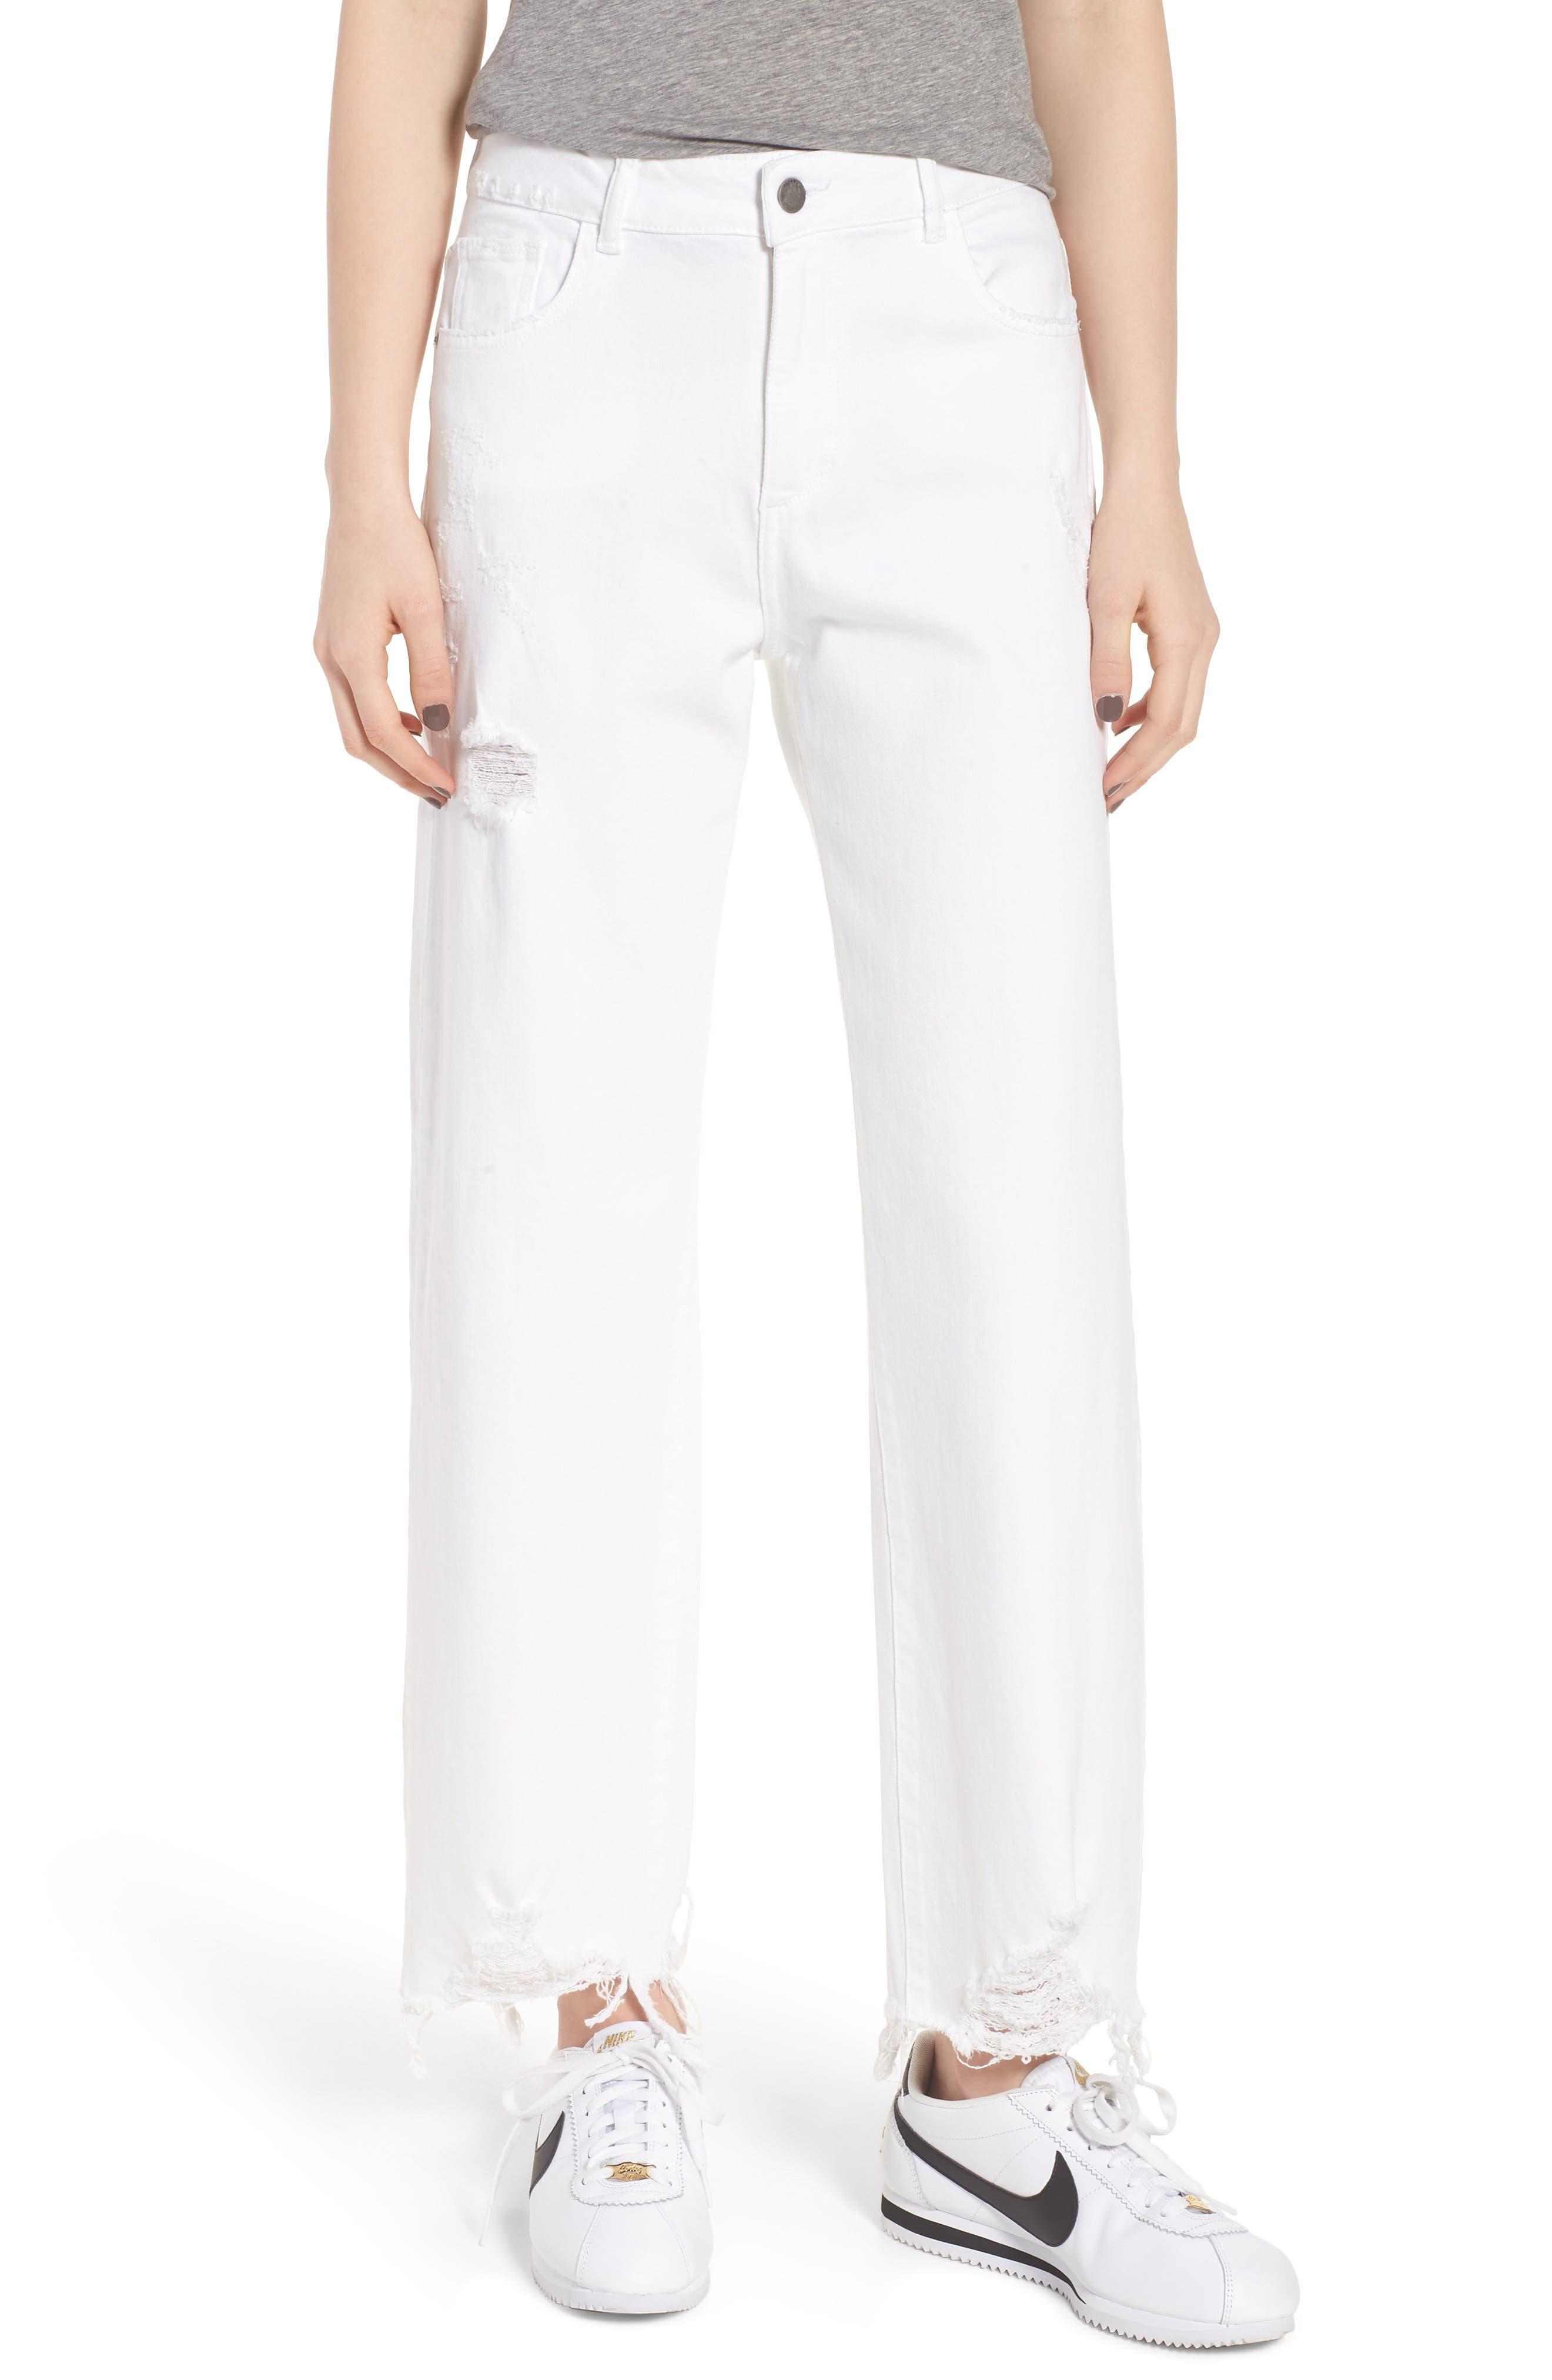 Hepburn High Waist Wide Leg Jeans,                         Main,                         color, 100